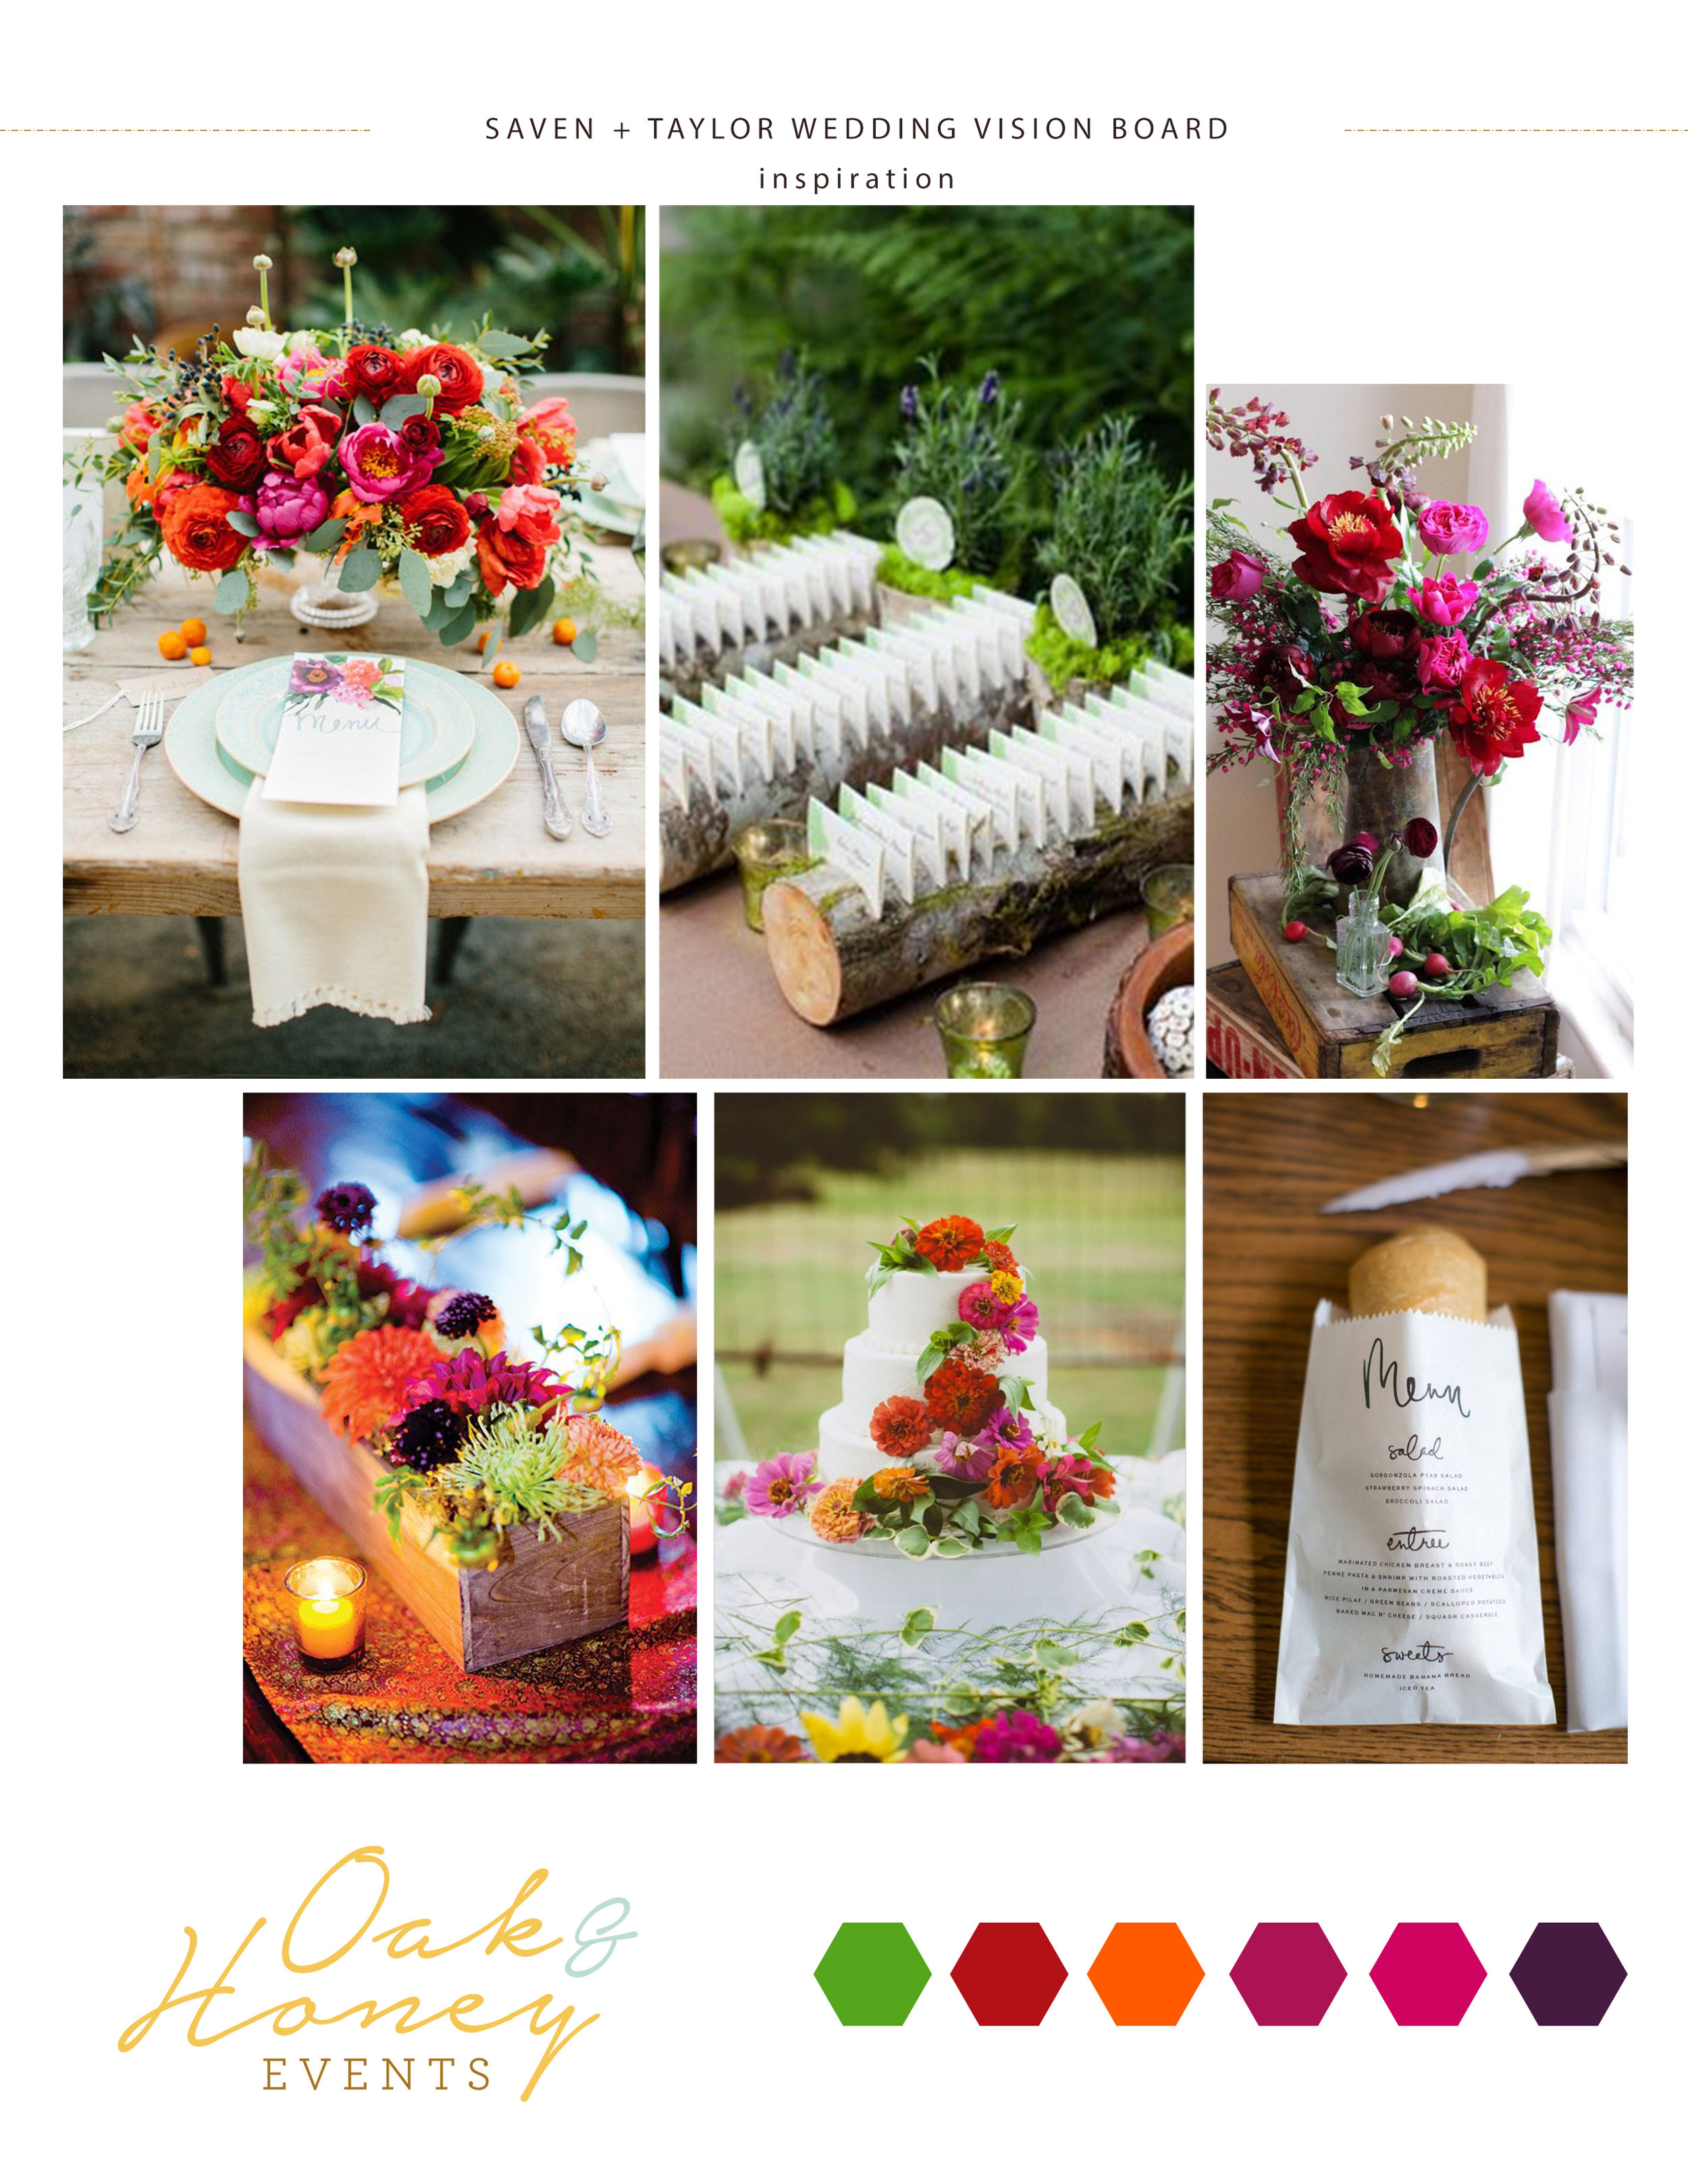 Colorful wedding vision board